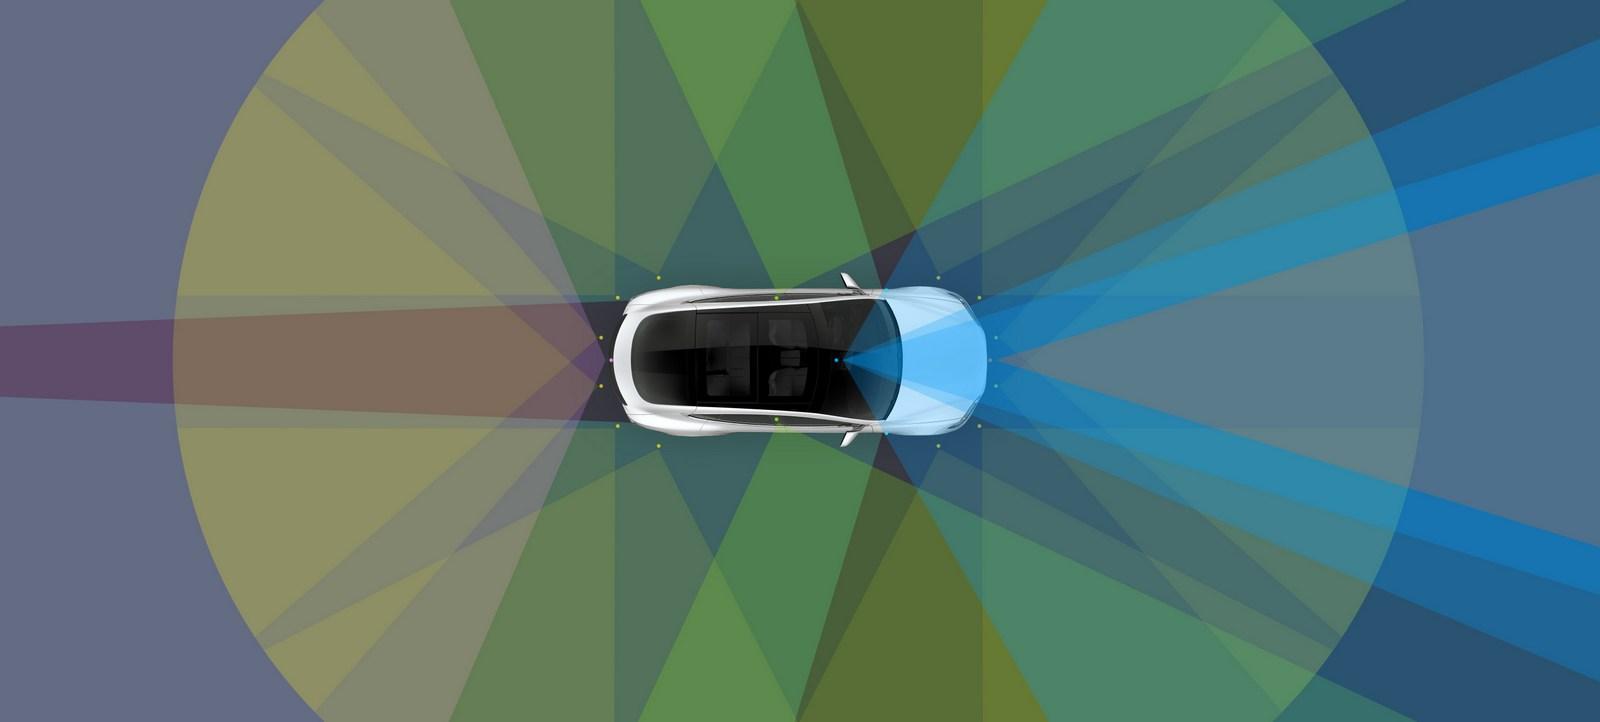 tesla-amd-autonomous-driving-chip-6.jpg